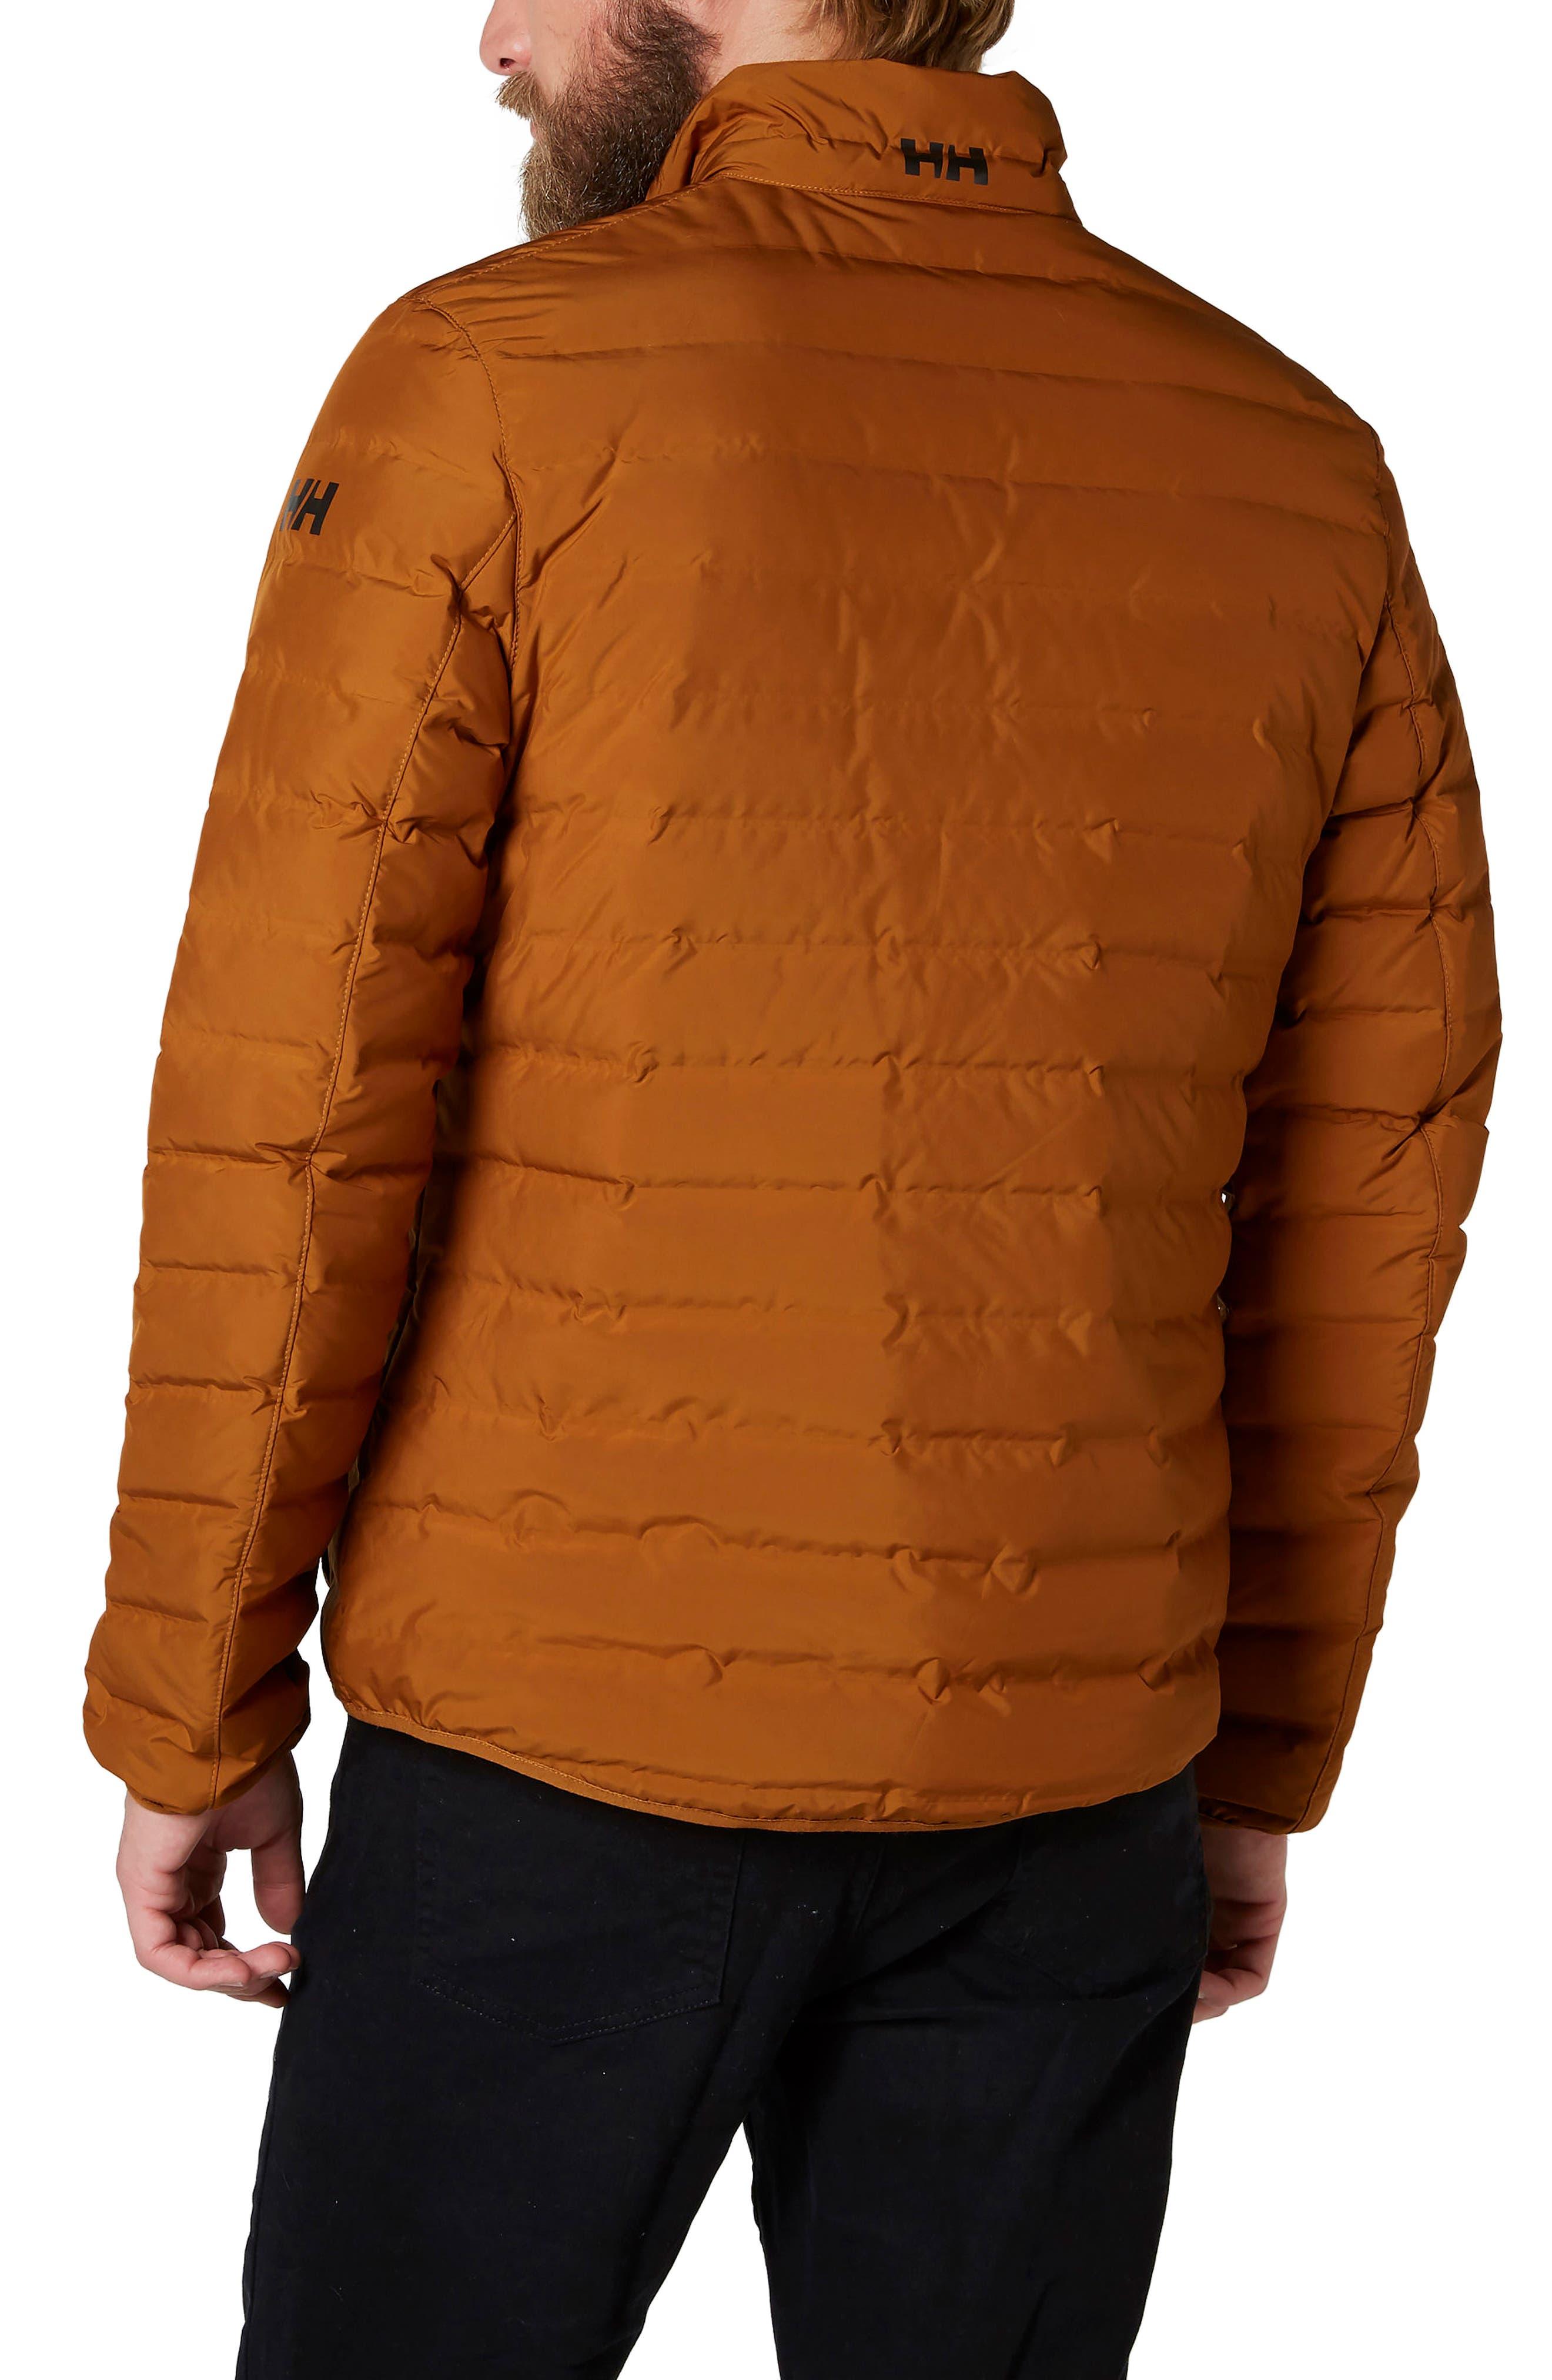 Urban Liner Jacket,                             Alternate thumbnail 2, color,                             Cinnamon